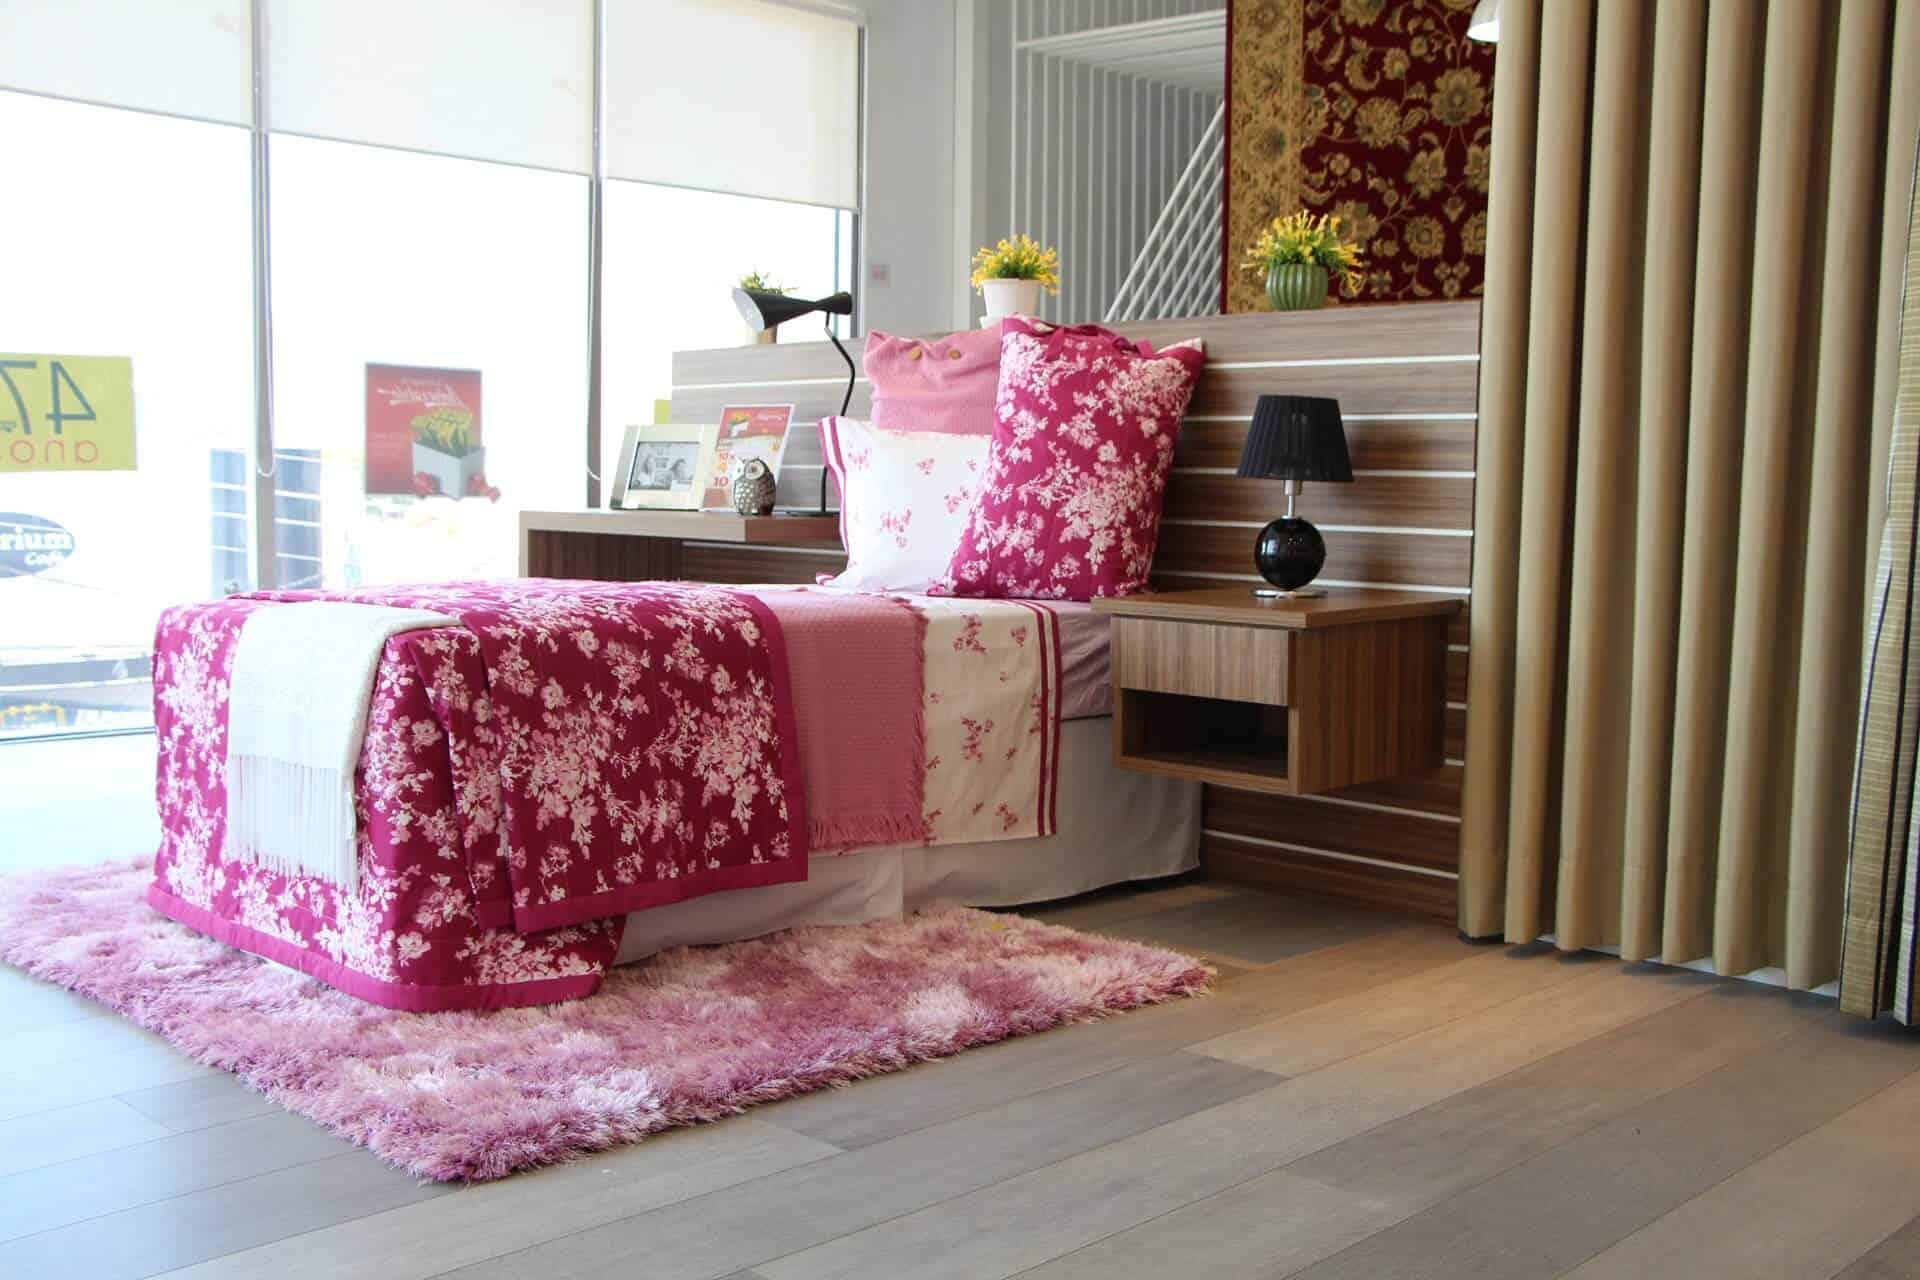 dormitorio-planejado_moveis-sob-medida-galeria-21